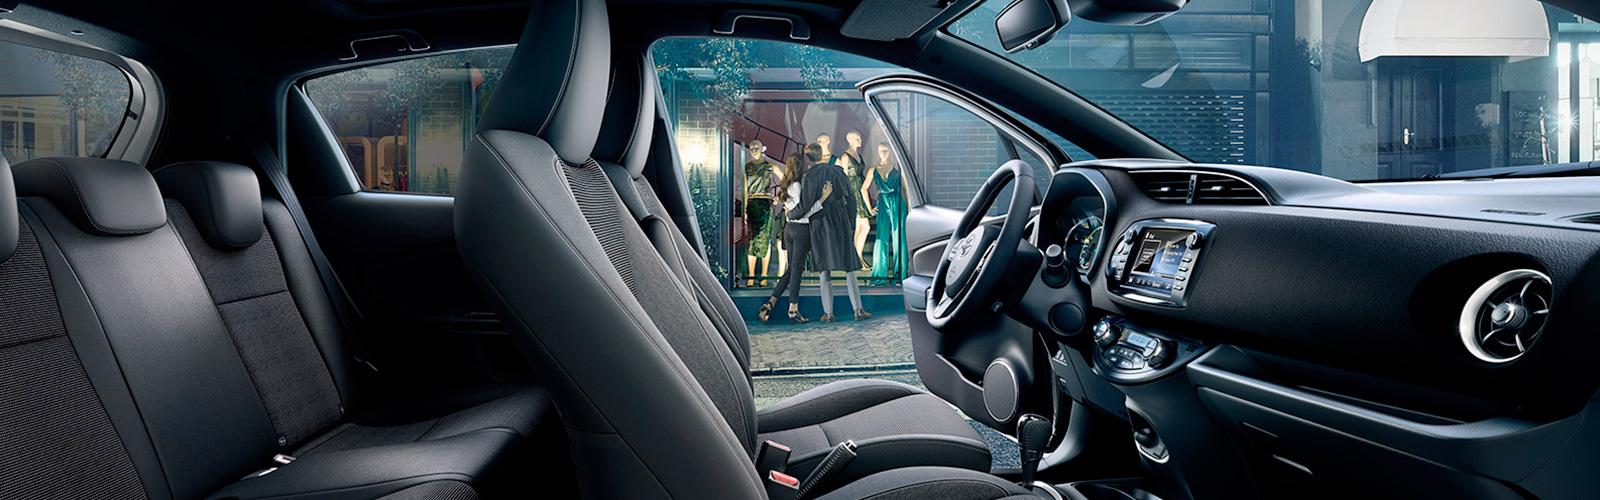 Interior del Toyota Yaris